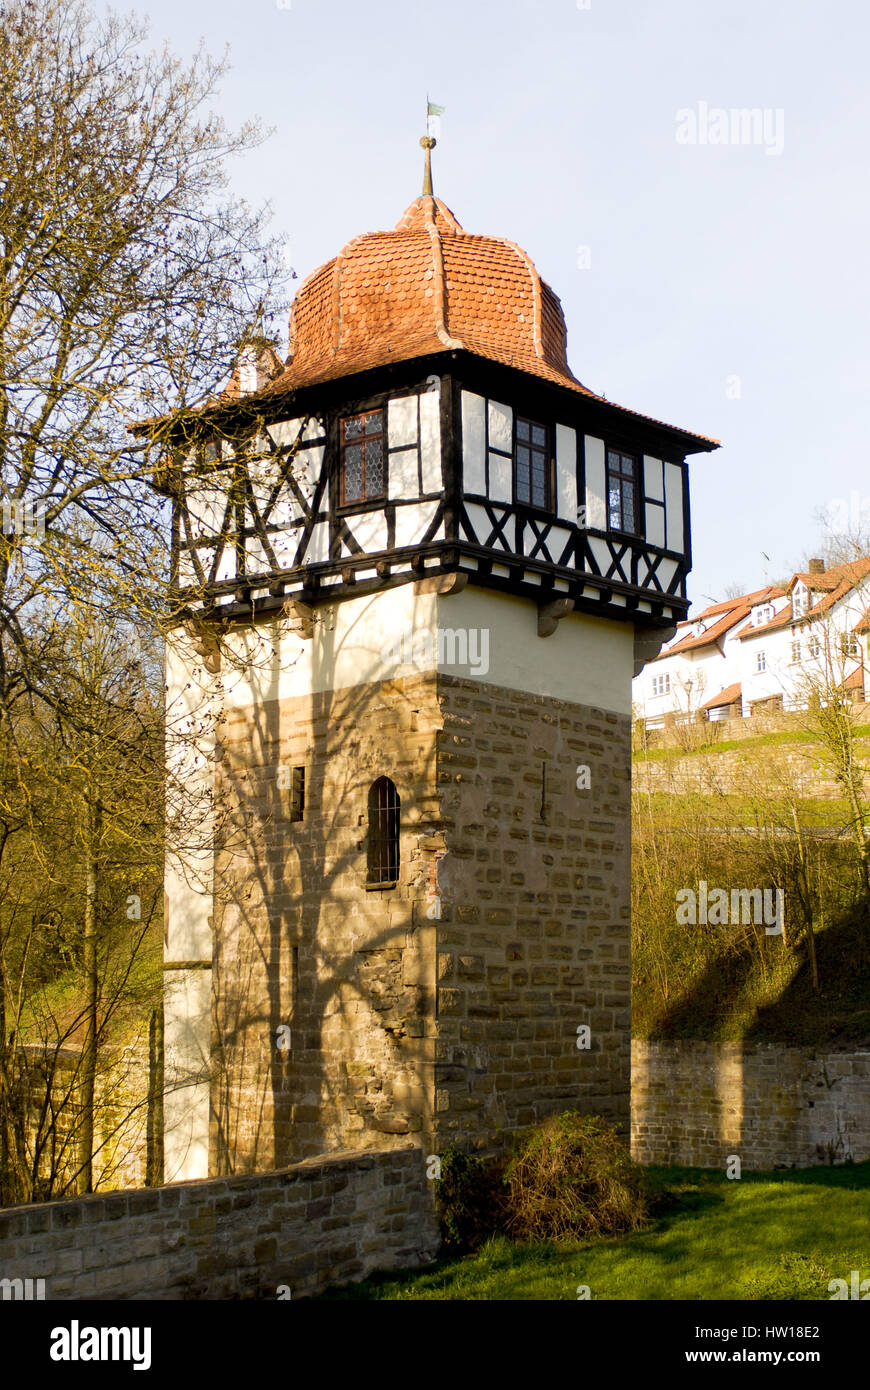 Tower in the cloister of Maulbronn, Turm im Kloster Maulbronn Stock Photo